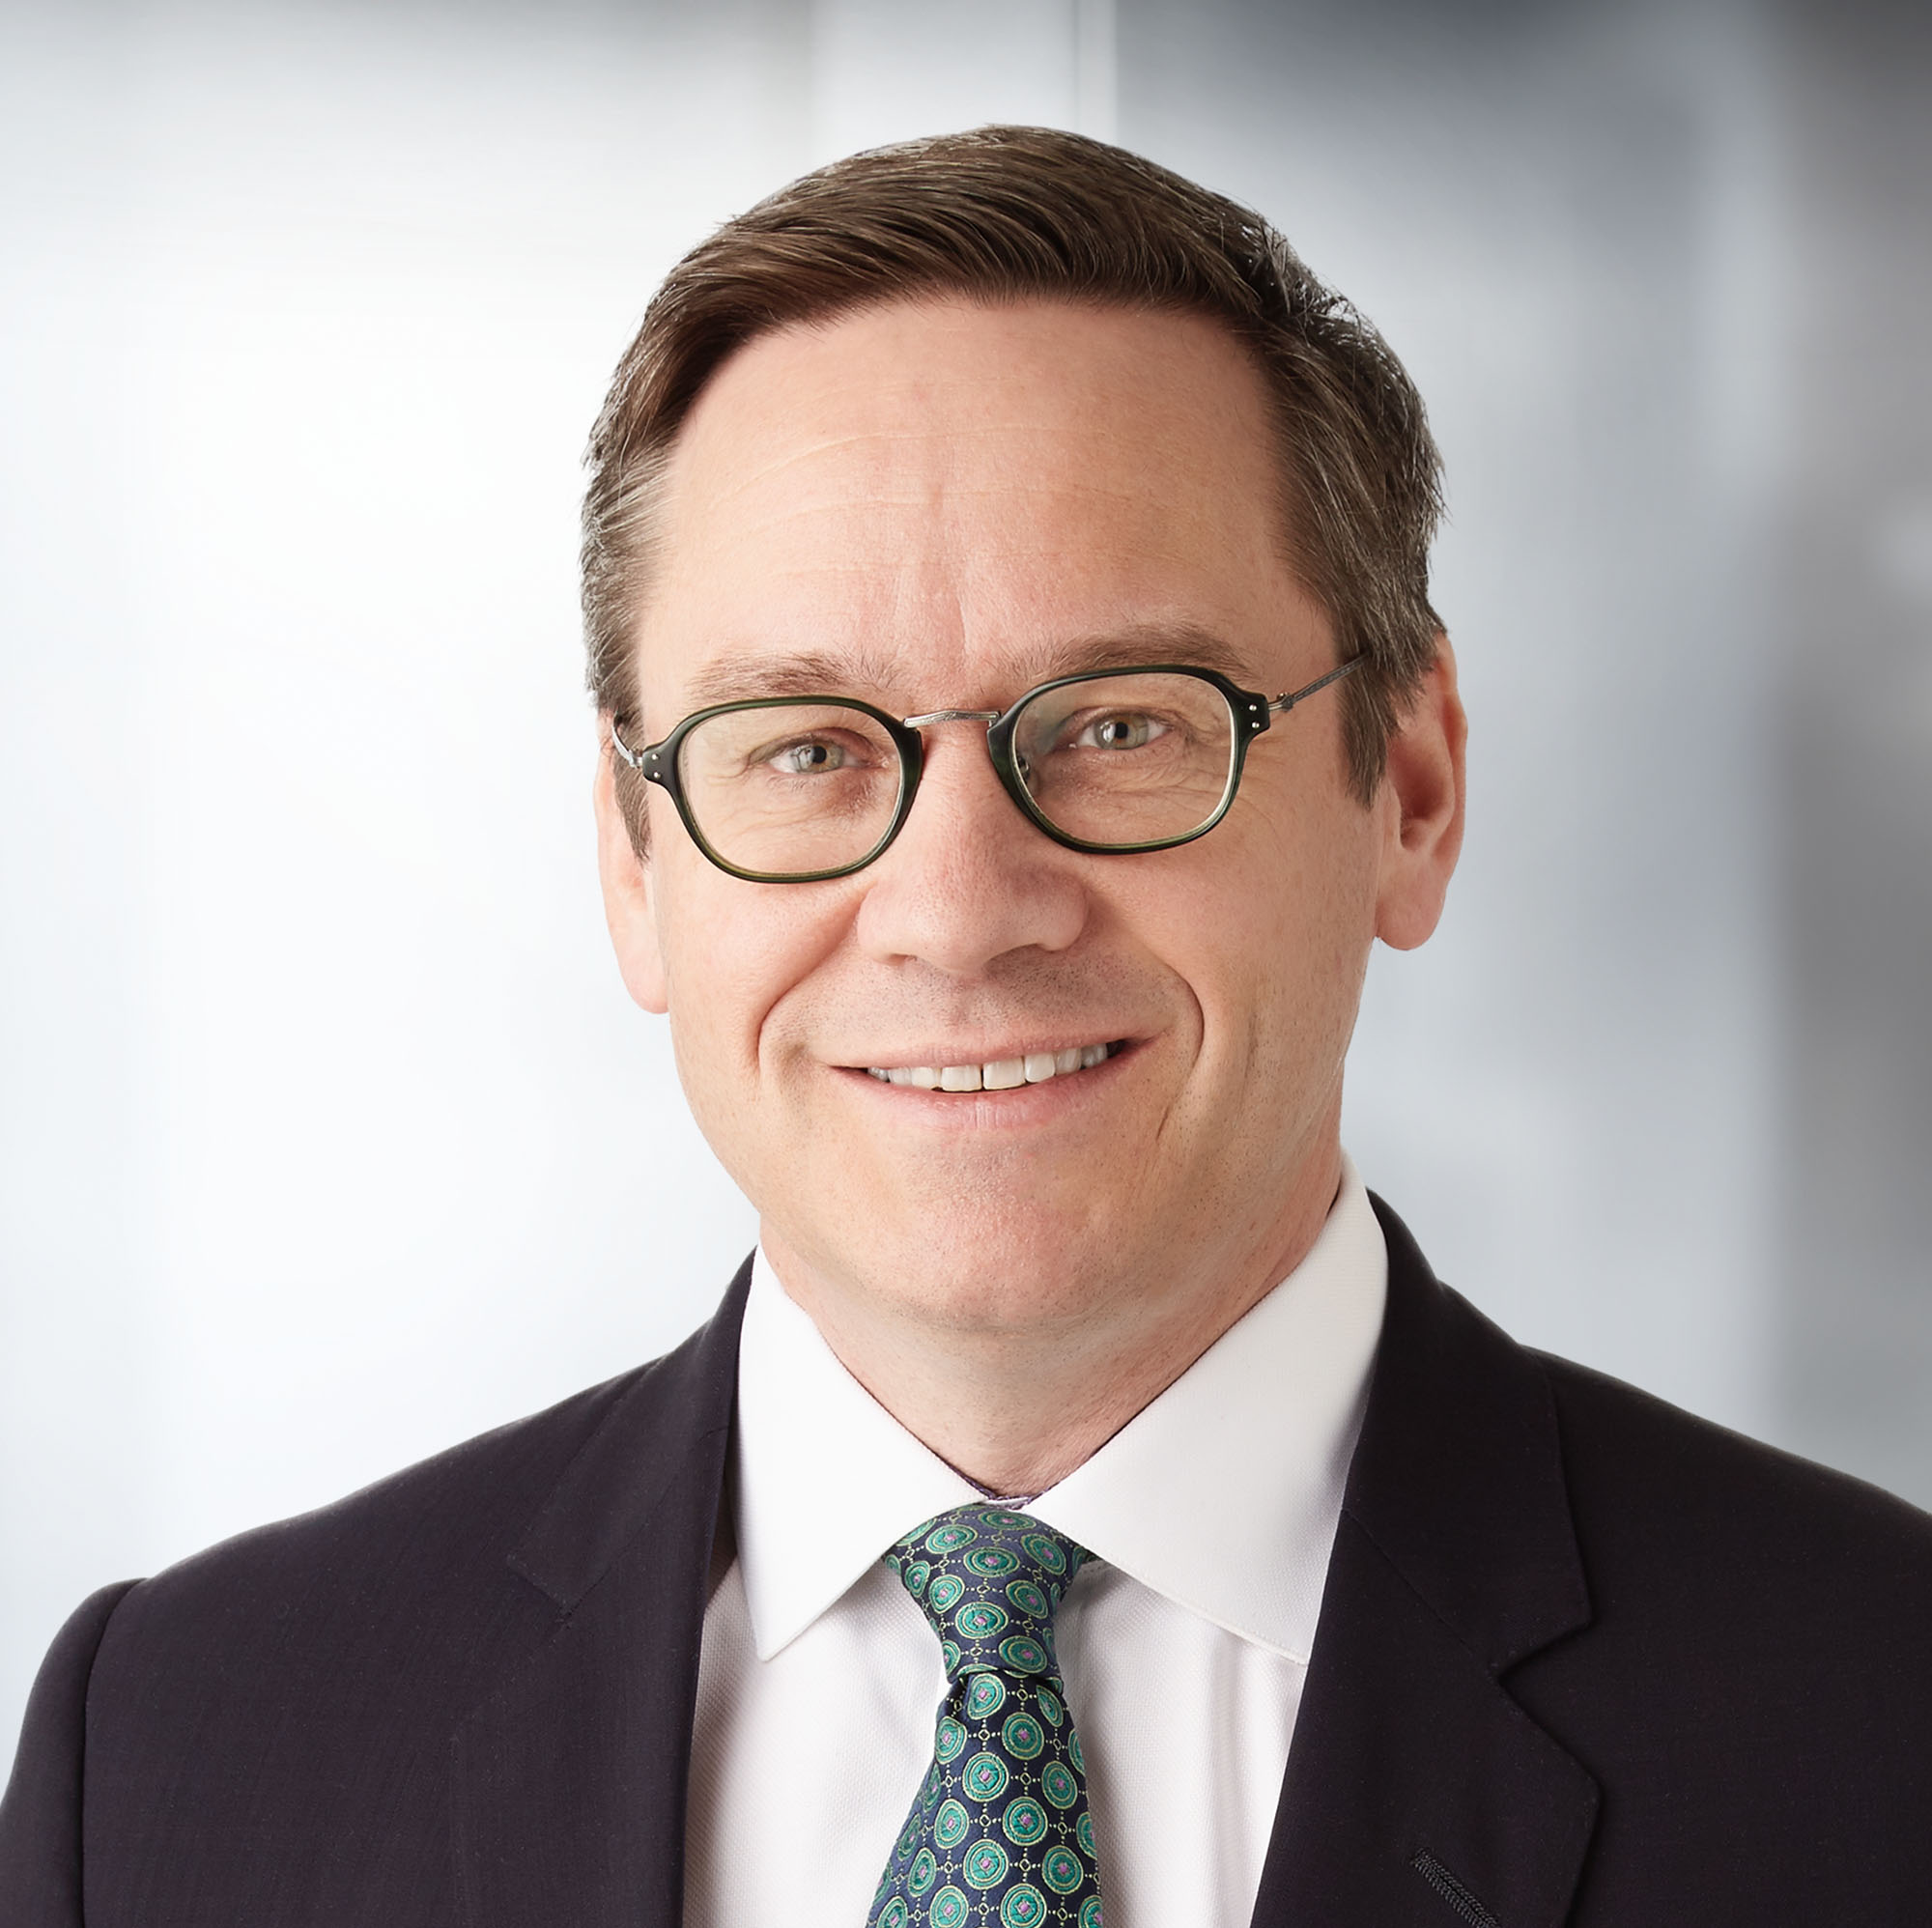 L. Greg Plater